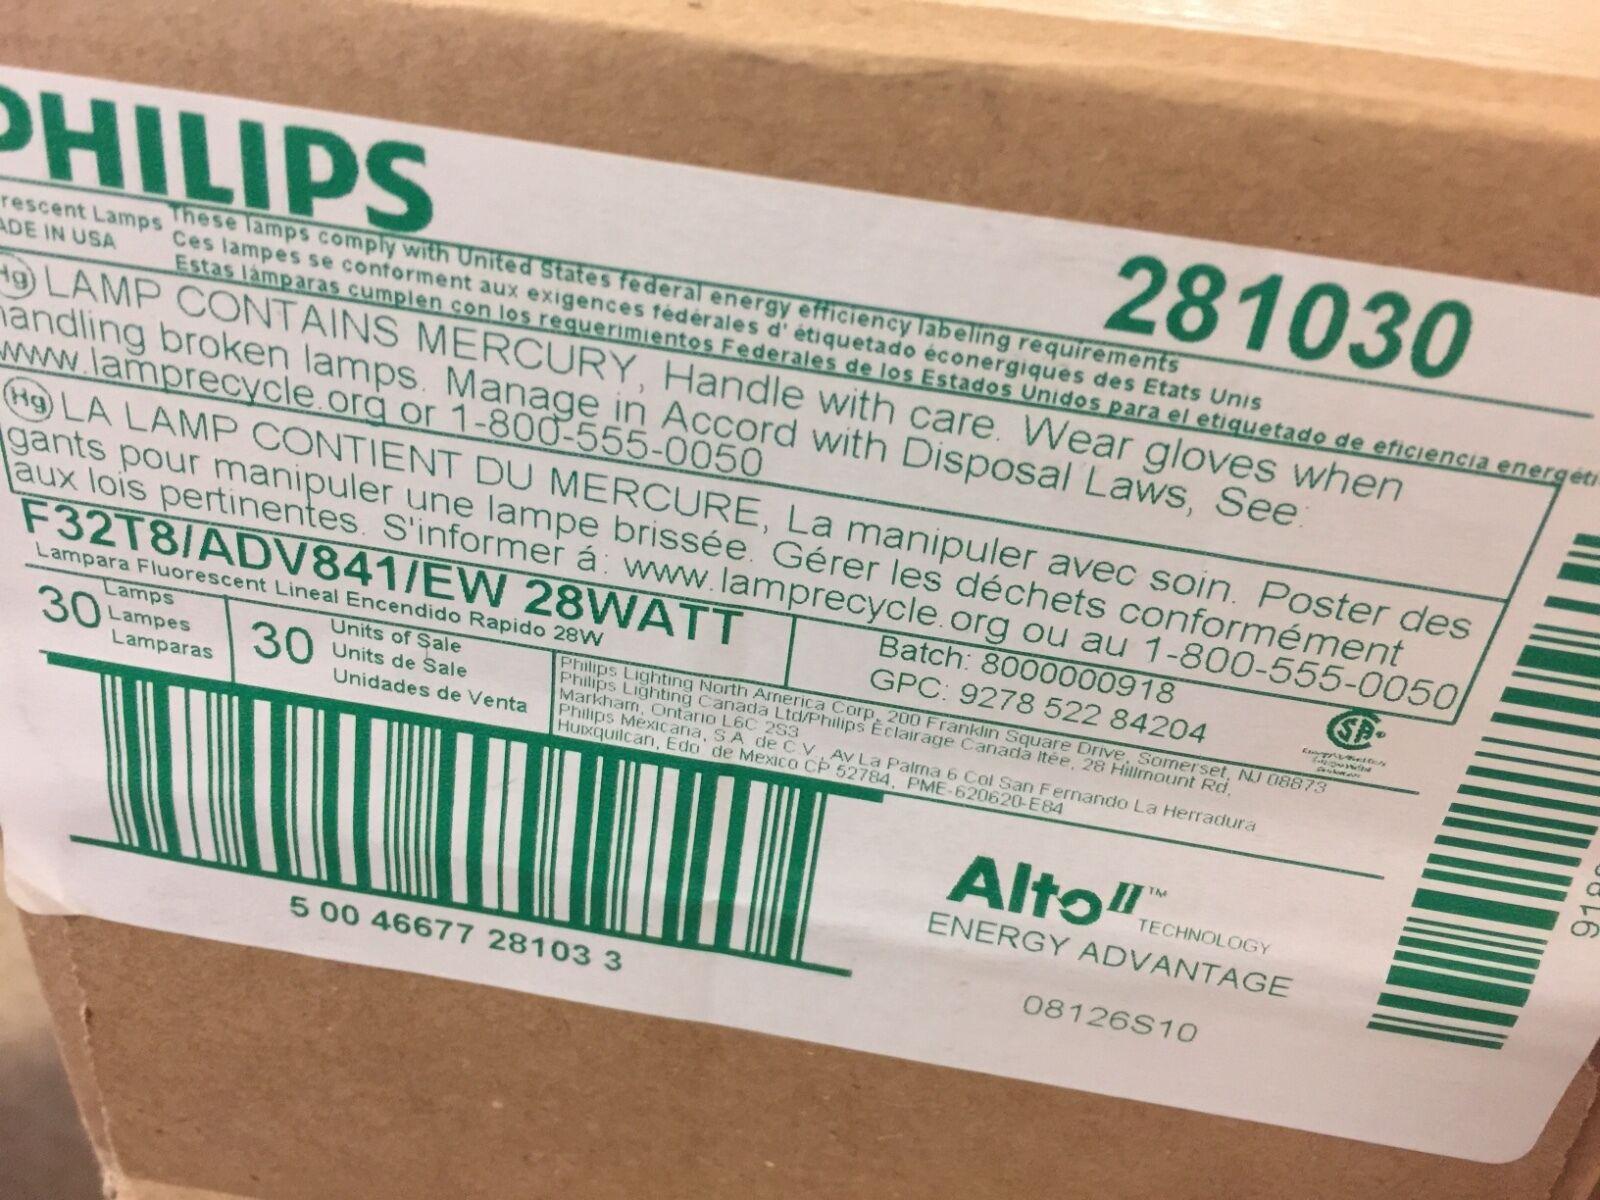 Philips 281030 - 28 vatios-F32T8 ADV841 EW LL 2,725 lúmenes 36,000 horas - - 4100